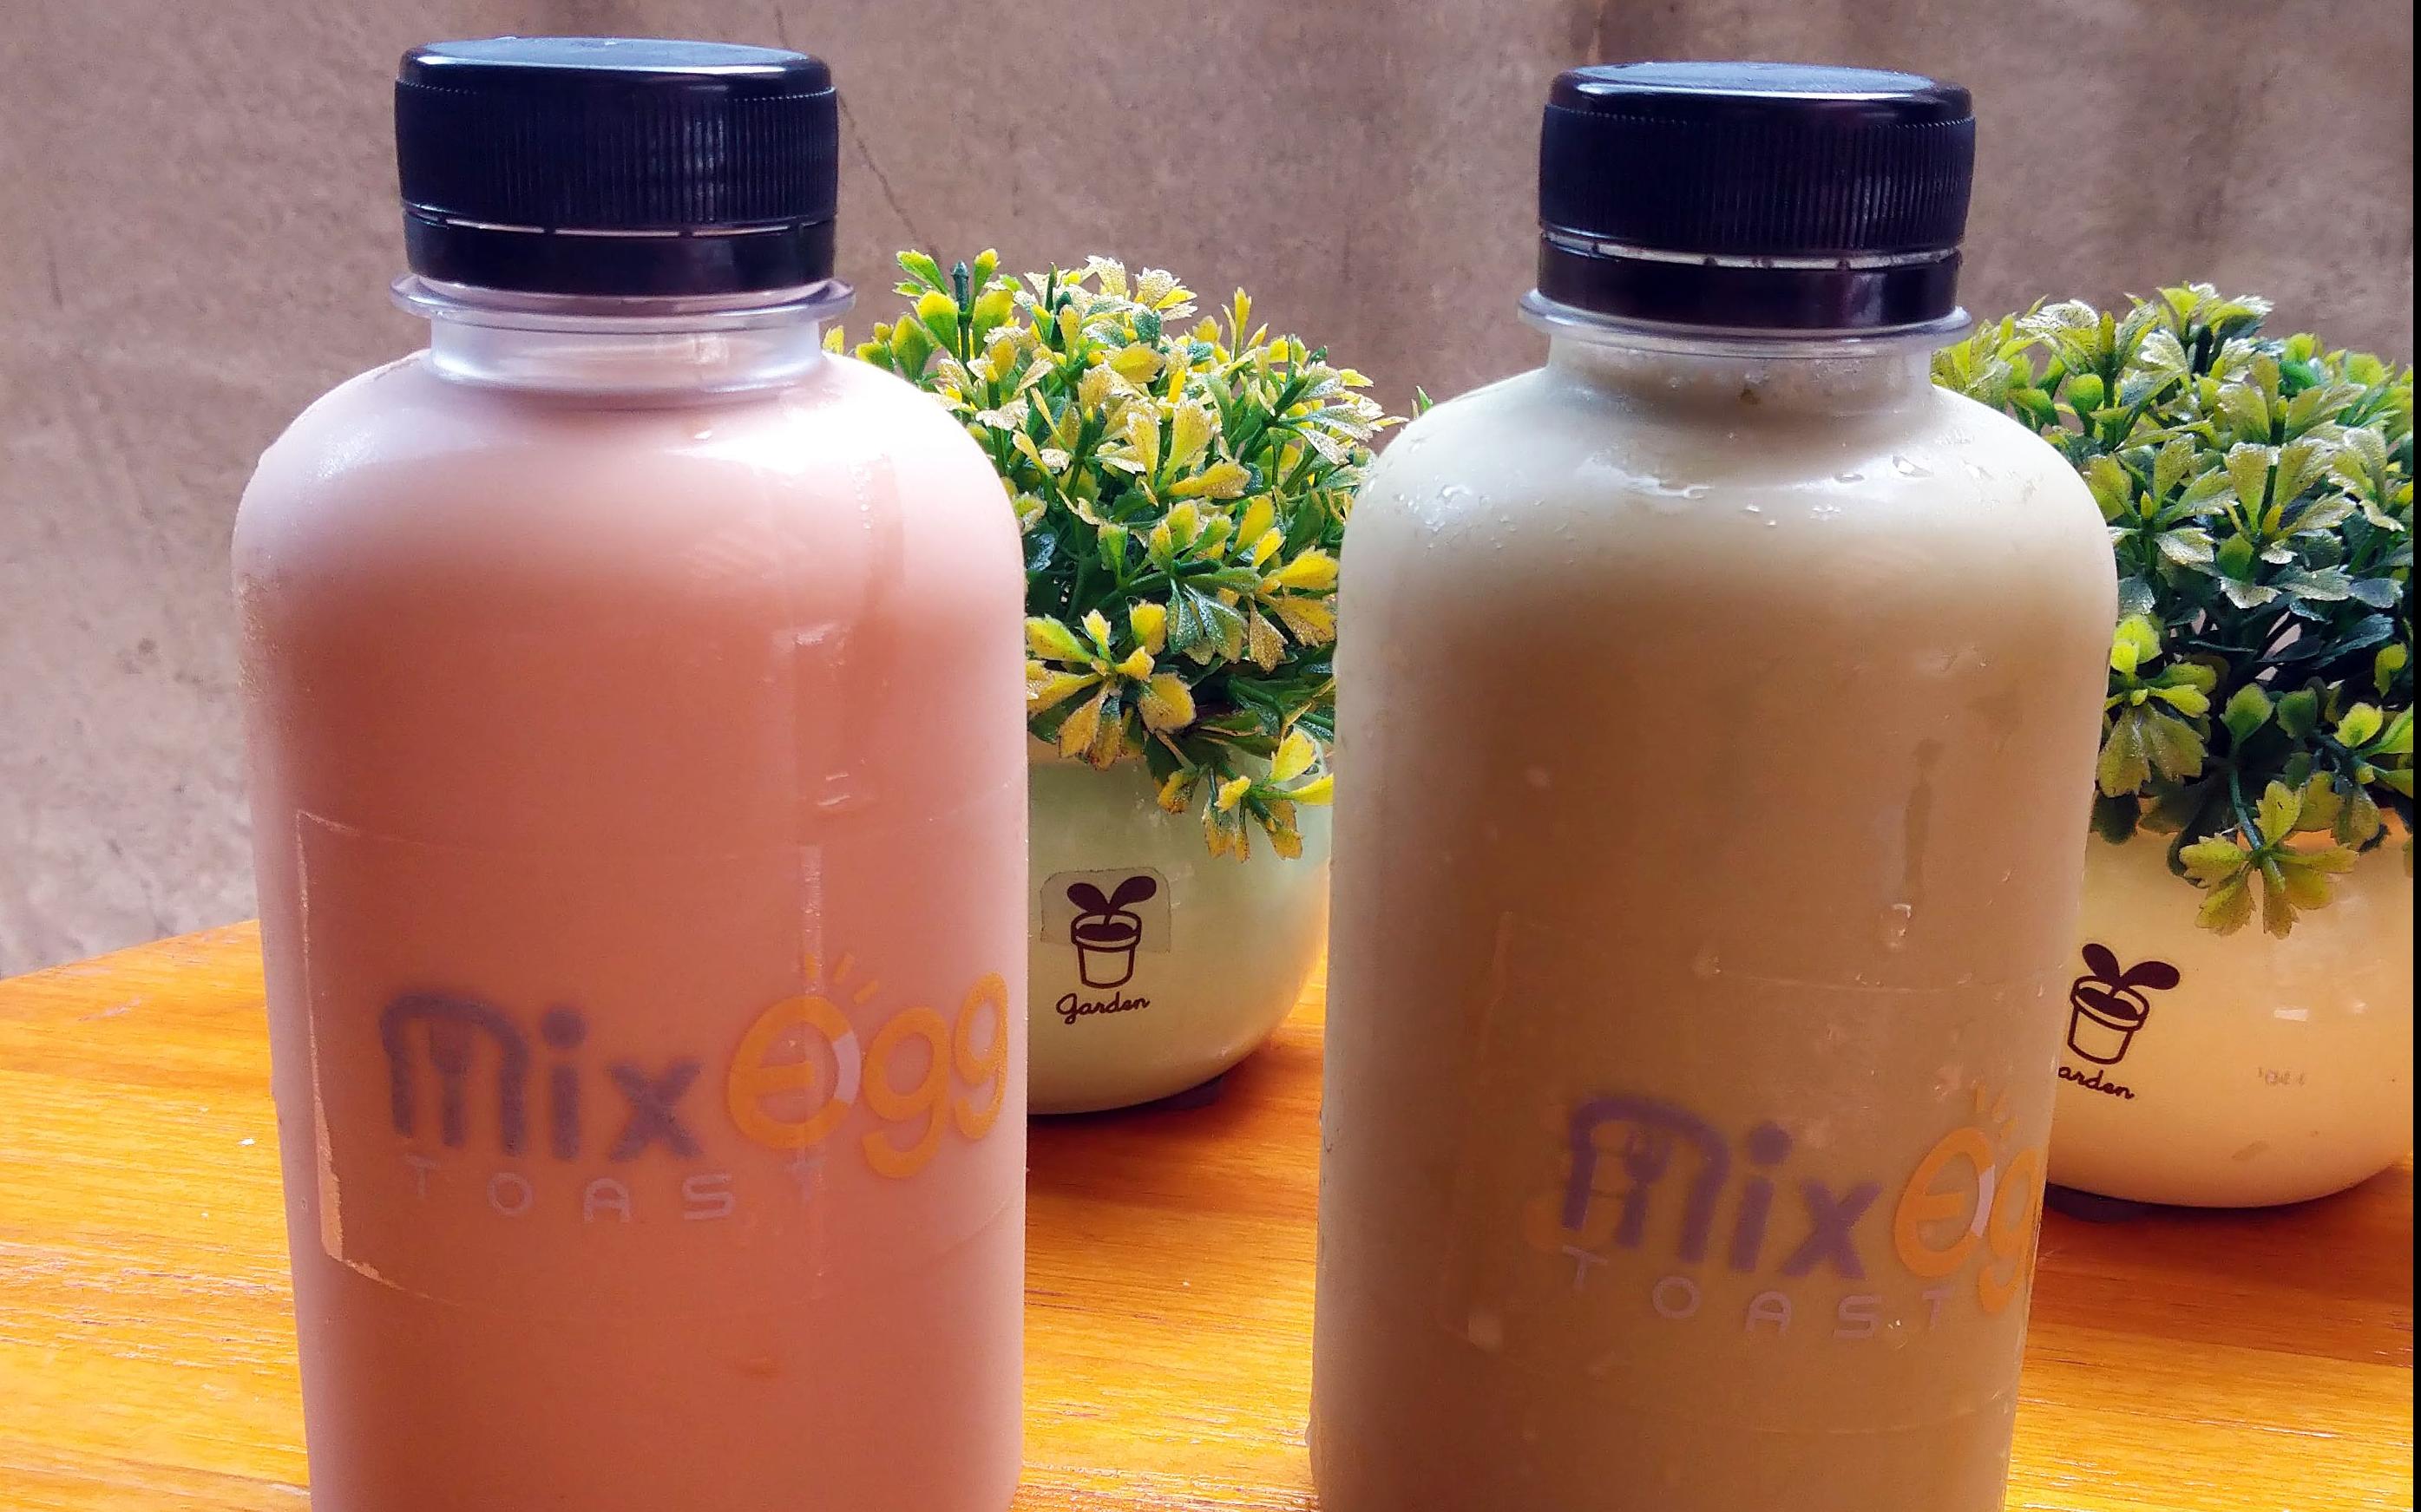 Mixegg鳳山瑞興店